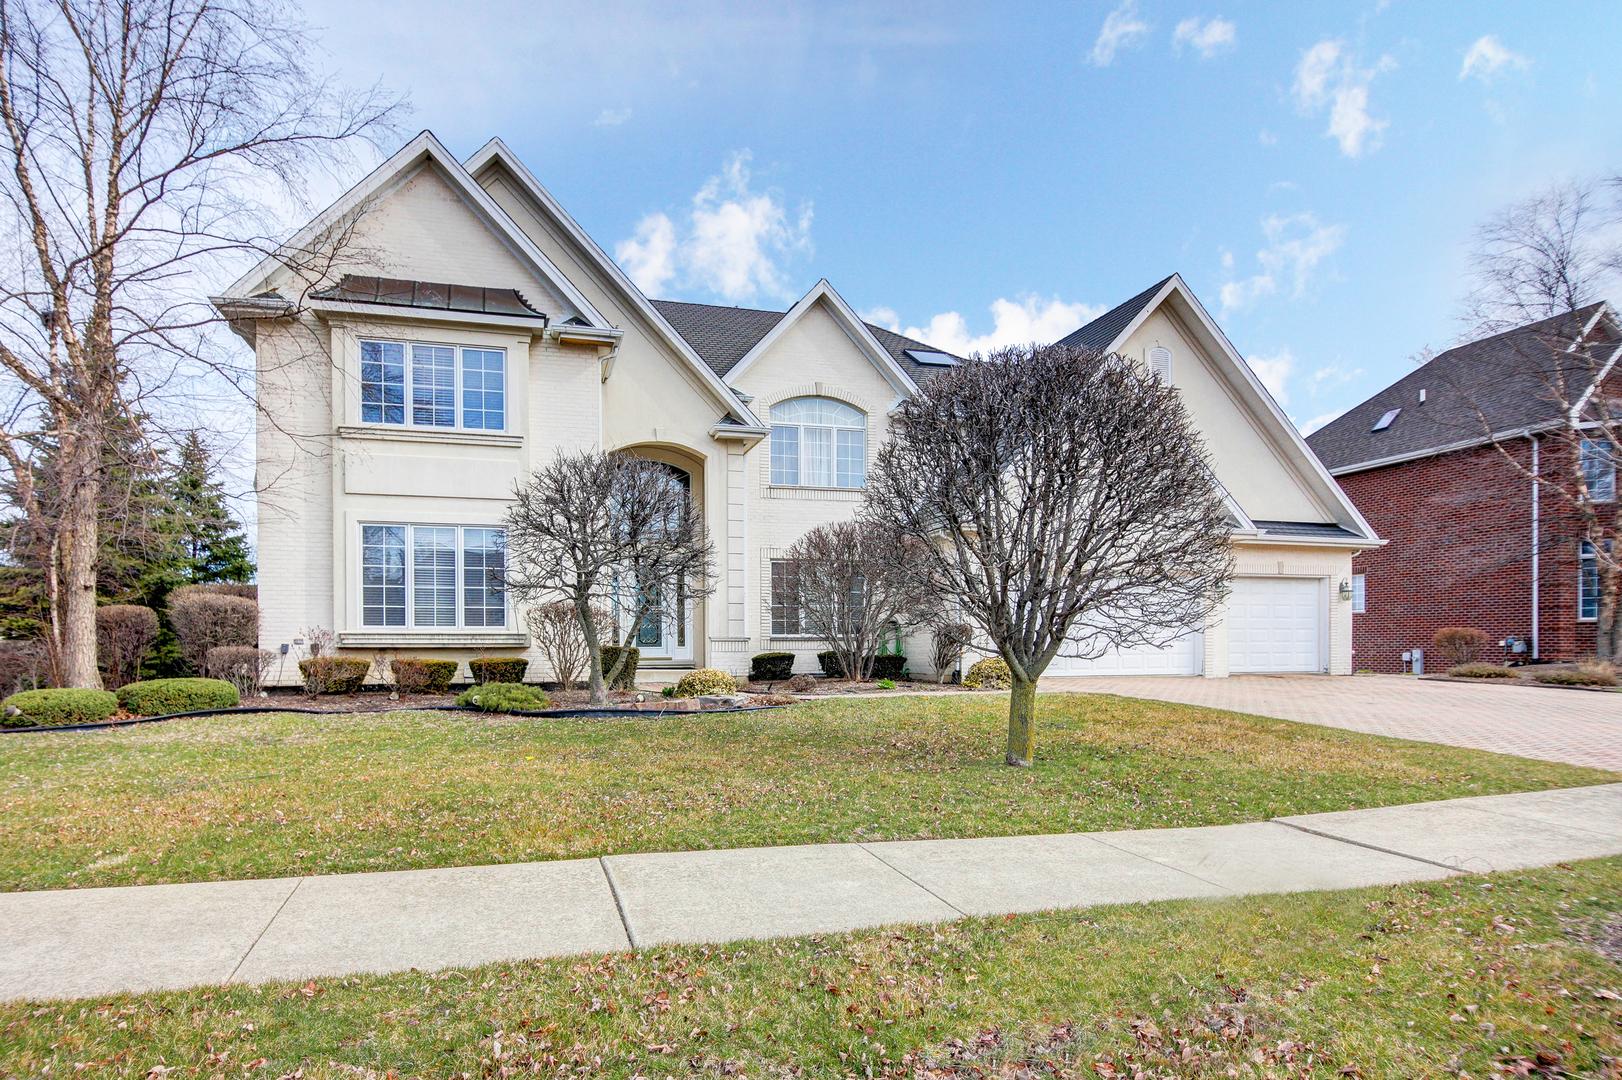 10840 Somer Lane, Orland Park, Illinois